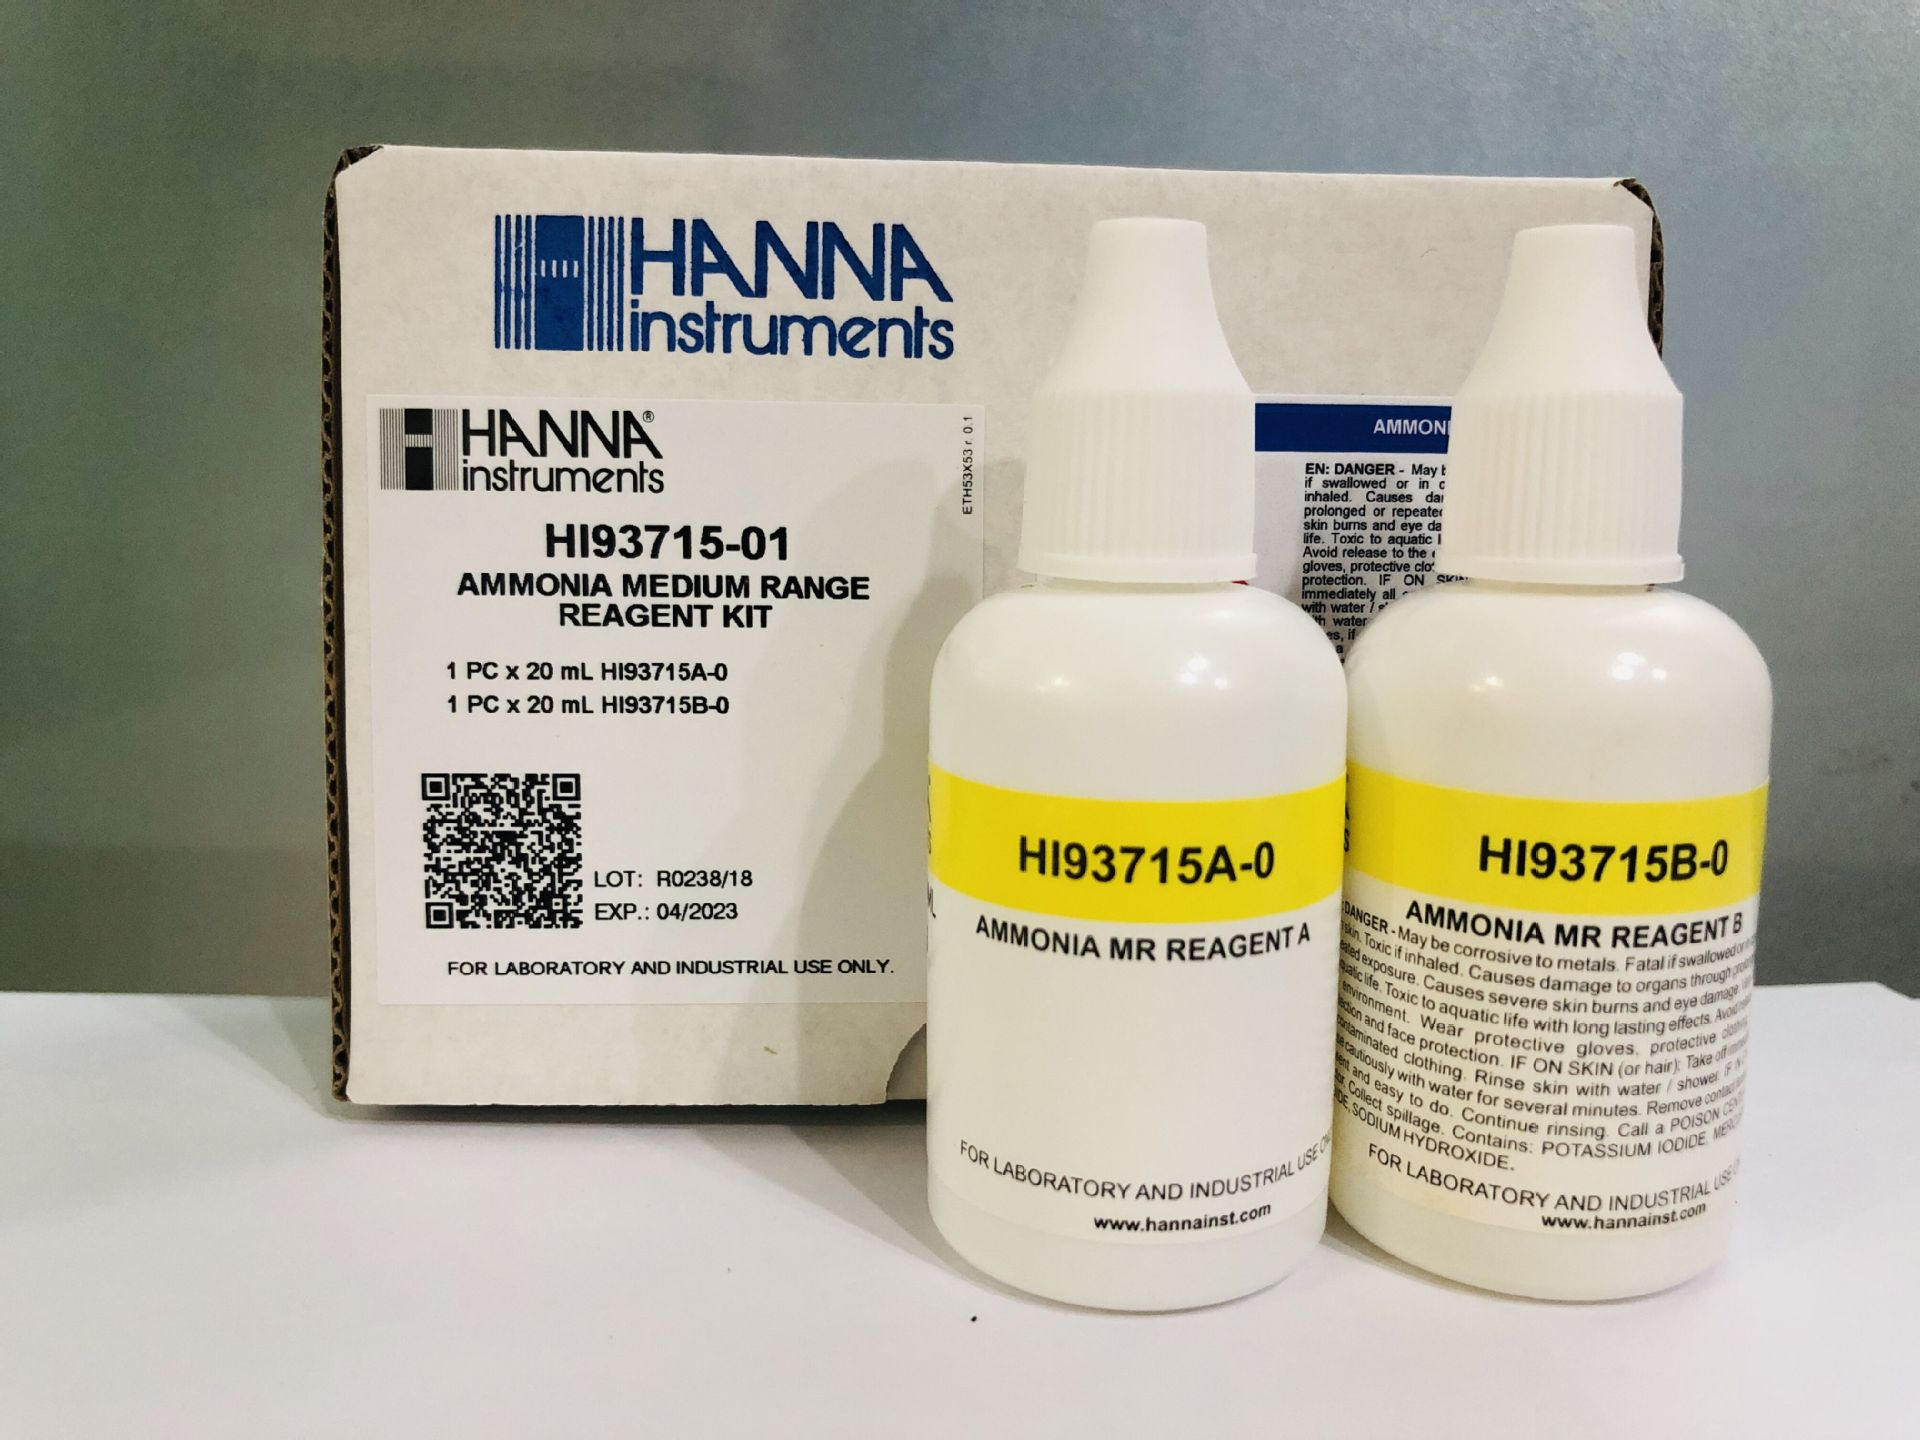 HI93715-01